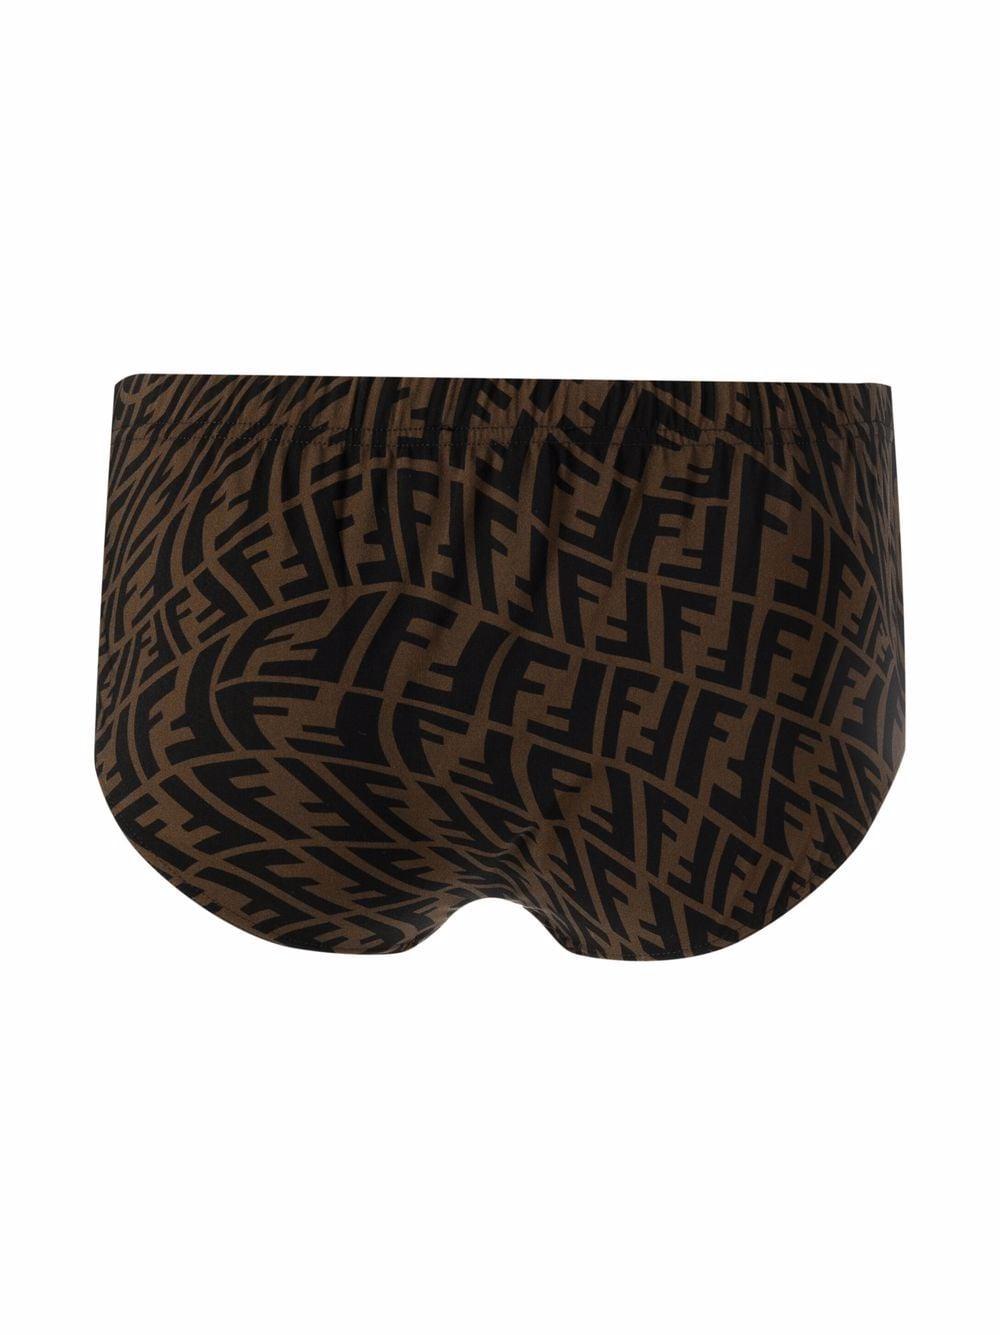 Brown and black Fendi Vertigo swimming briefs   FENDI      FXB076-AGBLF0QT2